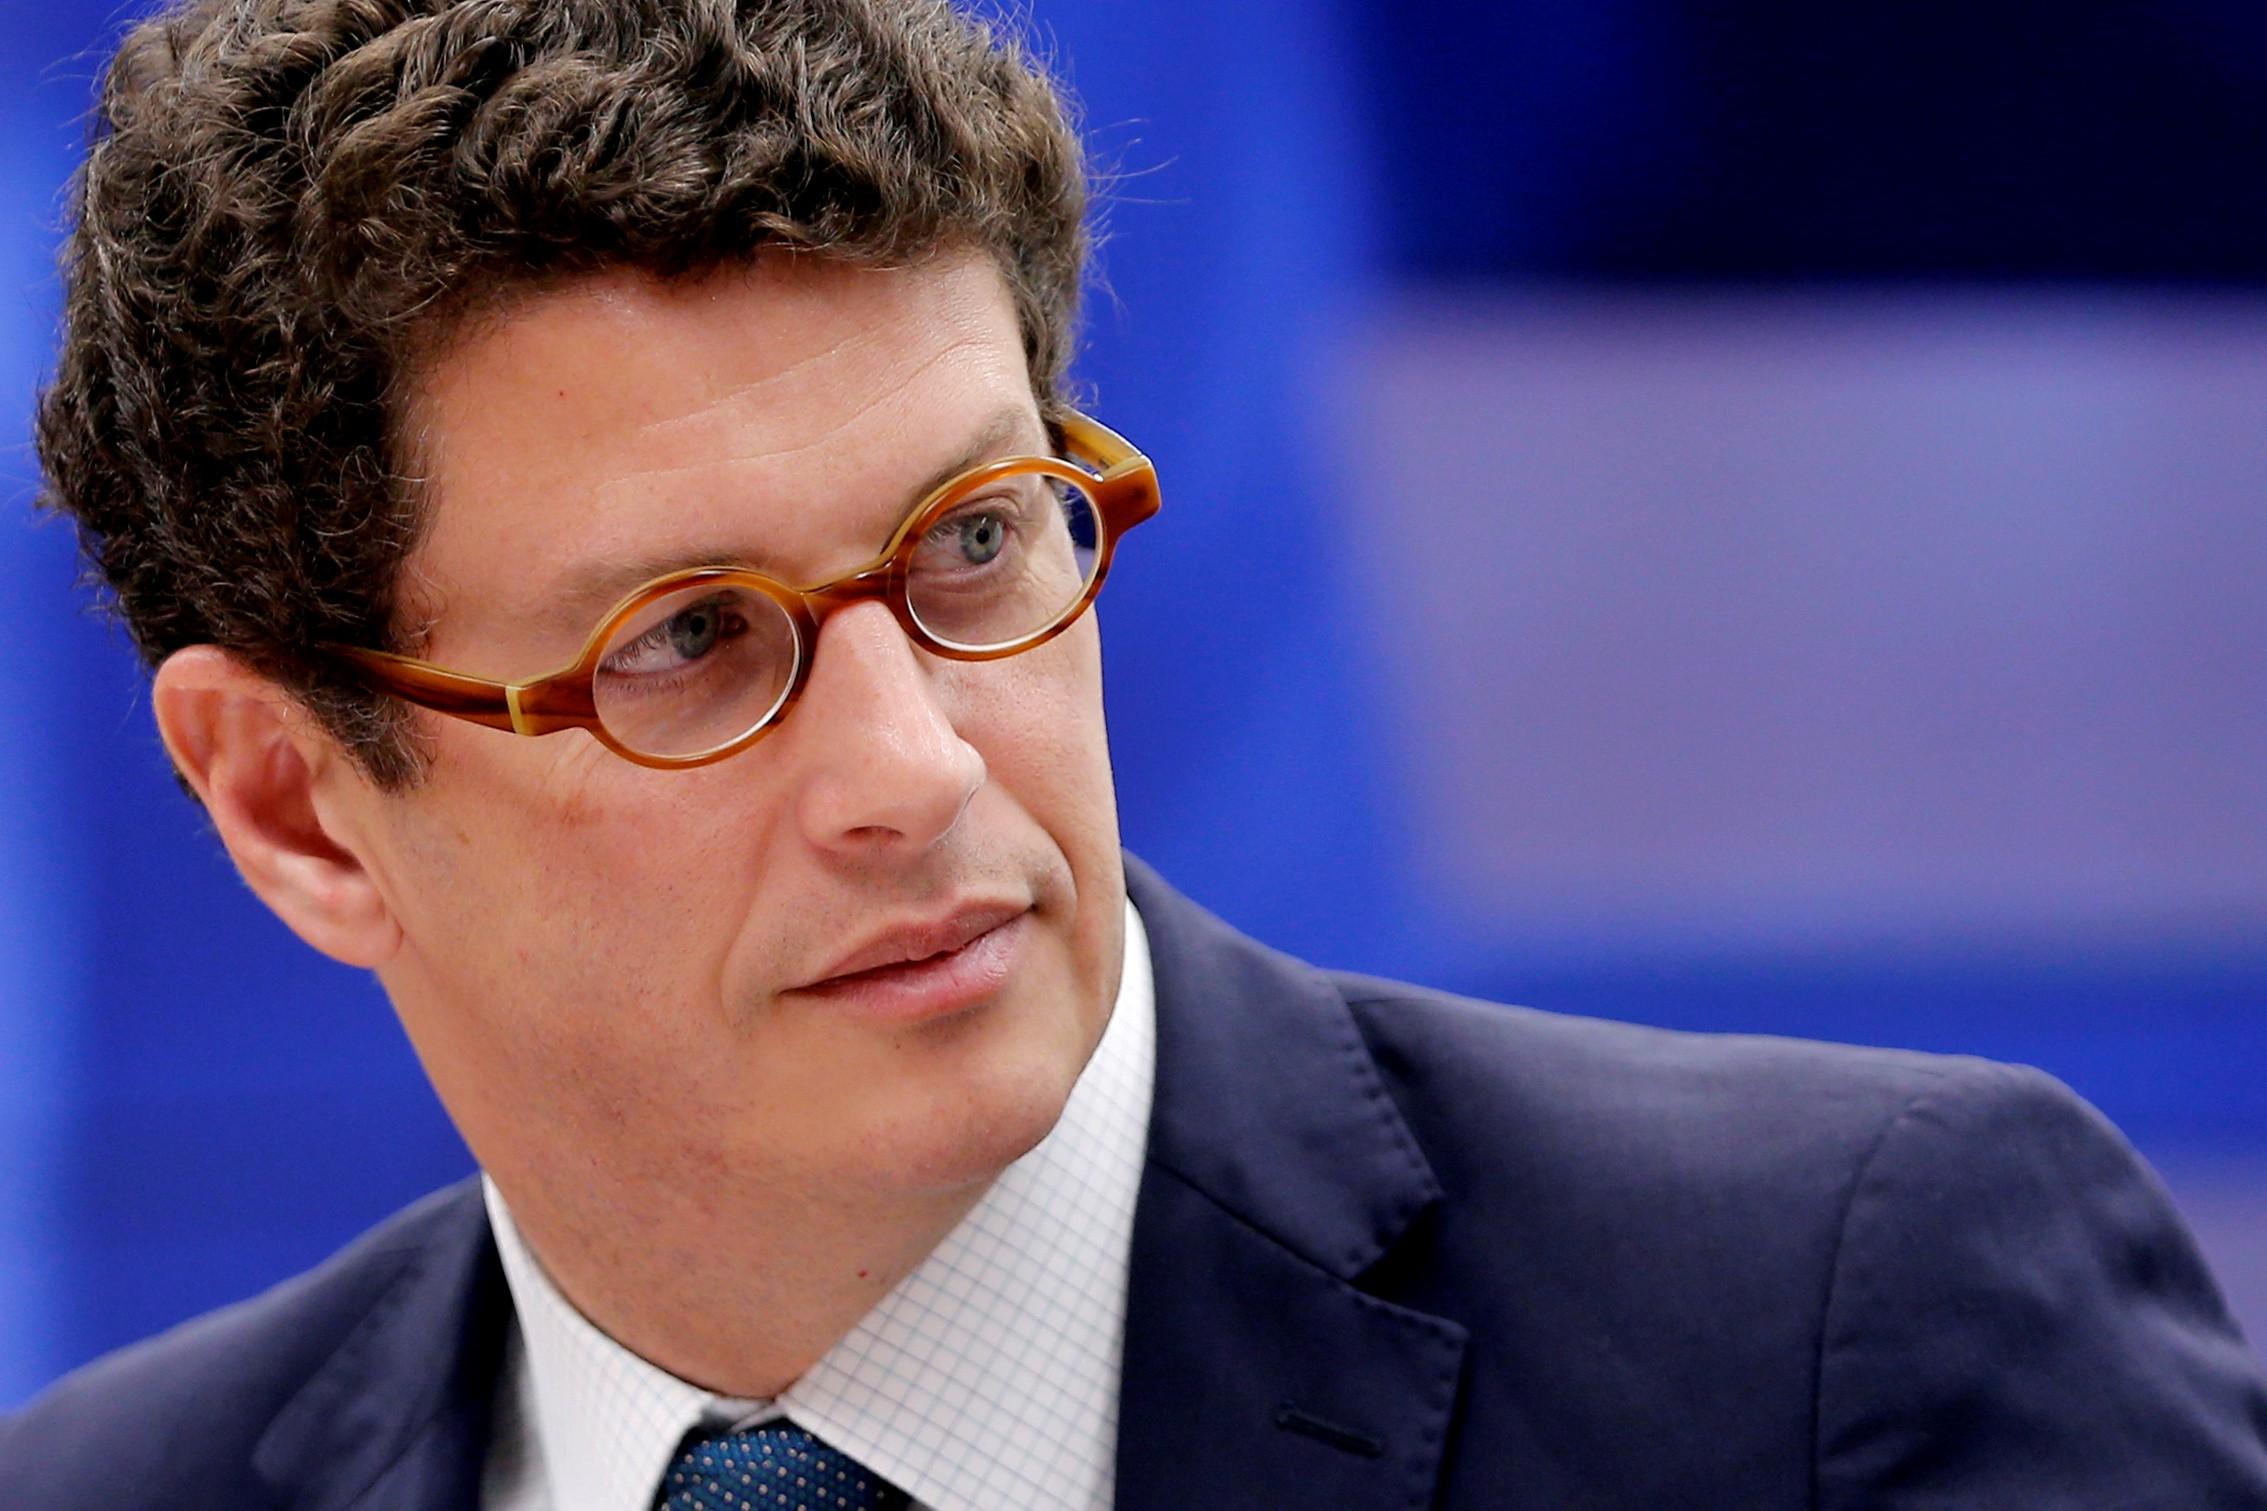 Ministério Público Federal pede afastamento do cargo do ministro Ricardo Salles